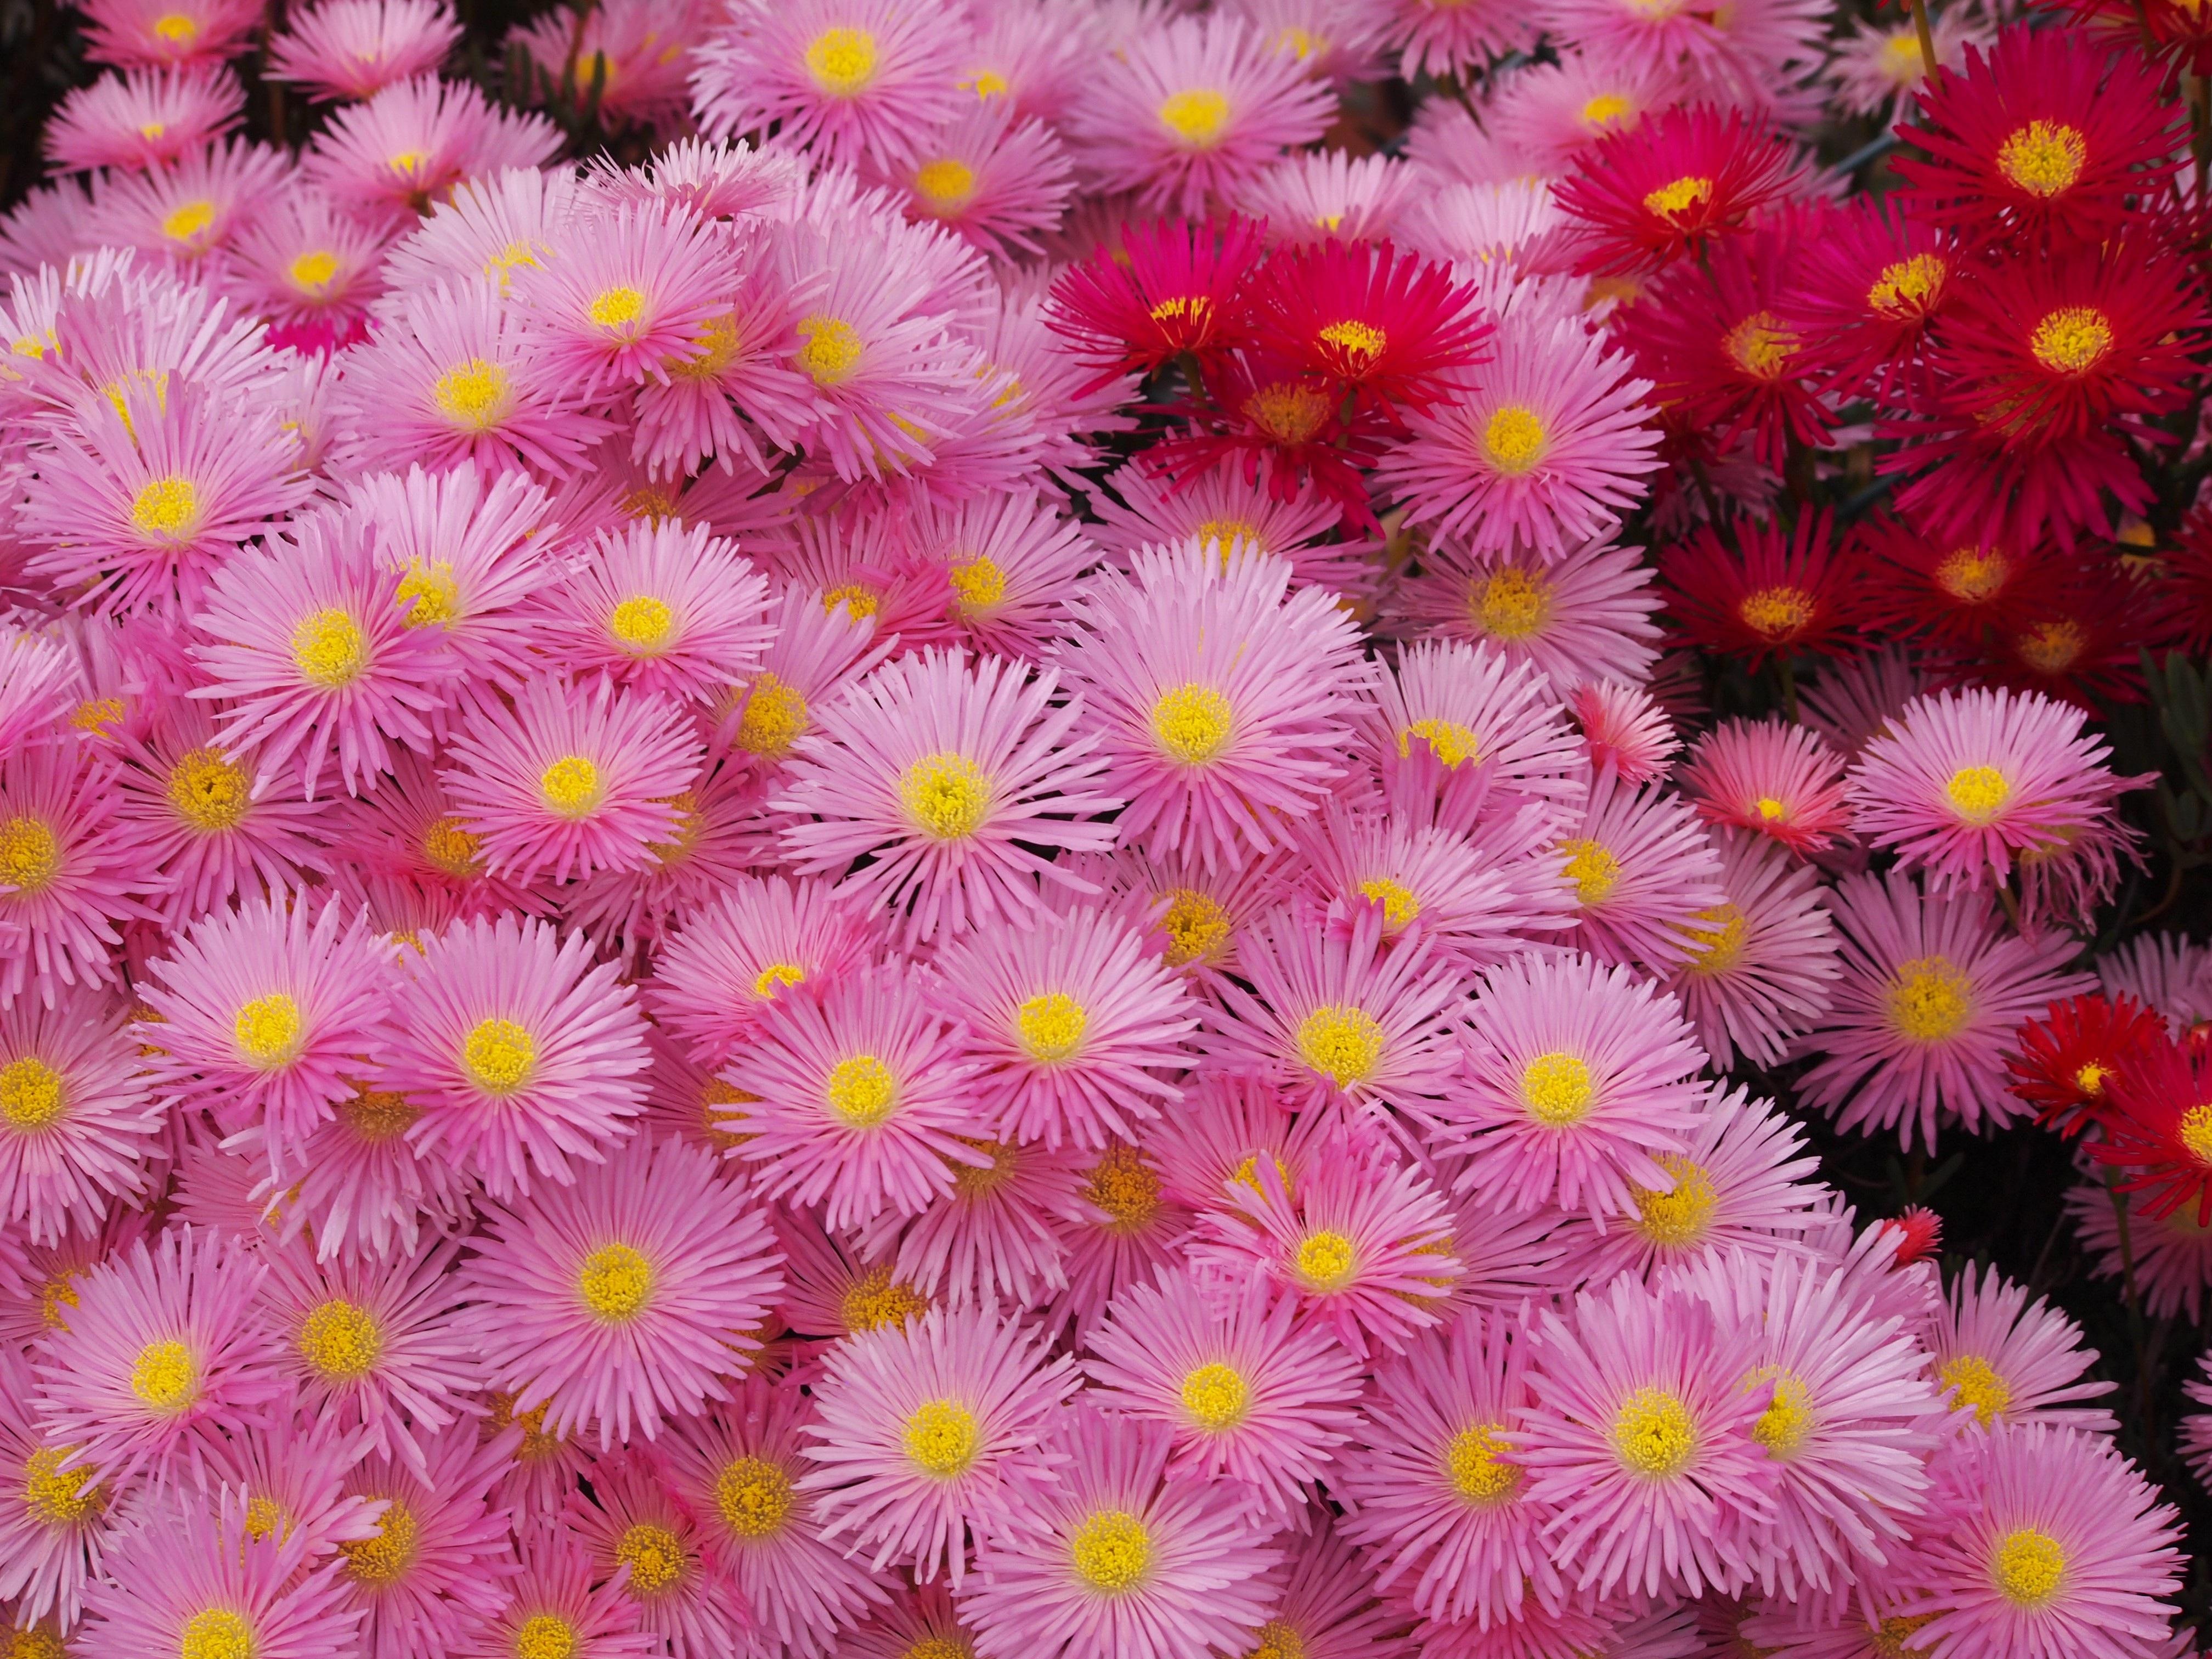 Gambar Menanam Daun Bunga Bunga Aster Hijau Botani Kuning